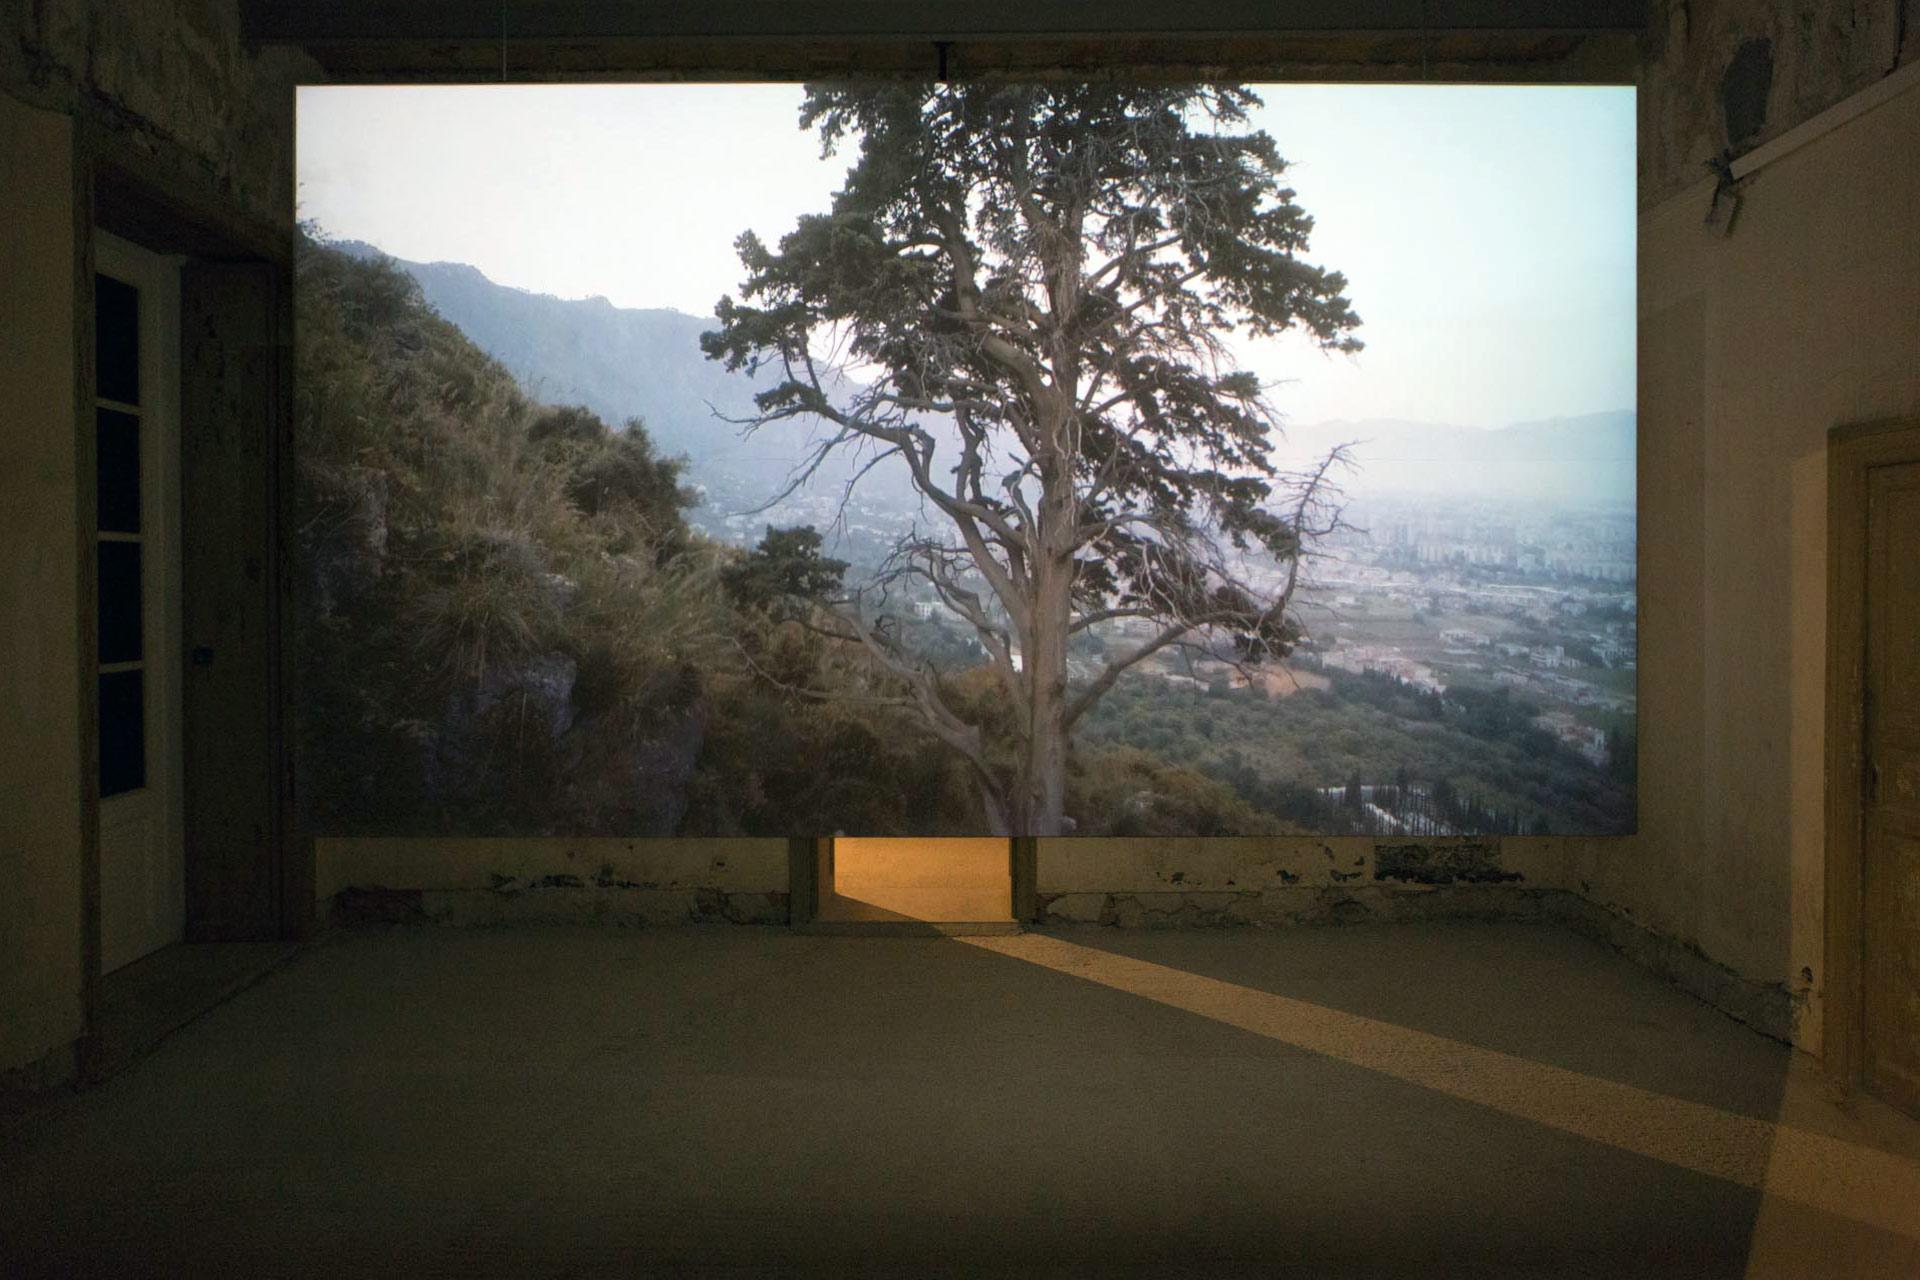 Uriel Orlow, Wishing Trees, 2018, Palazzo Butera, Garden of Flows, Manifesta 12, Palermo